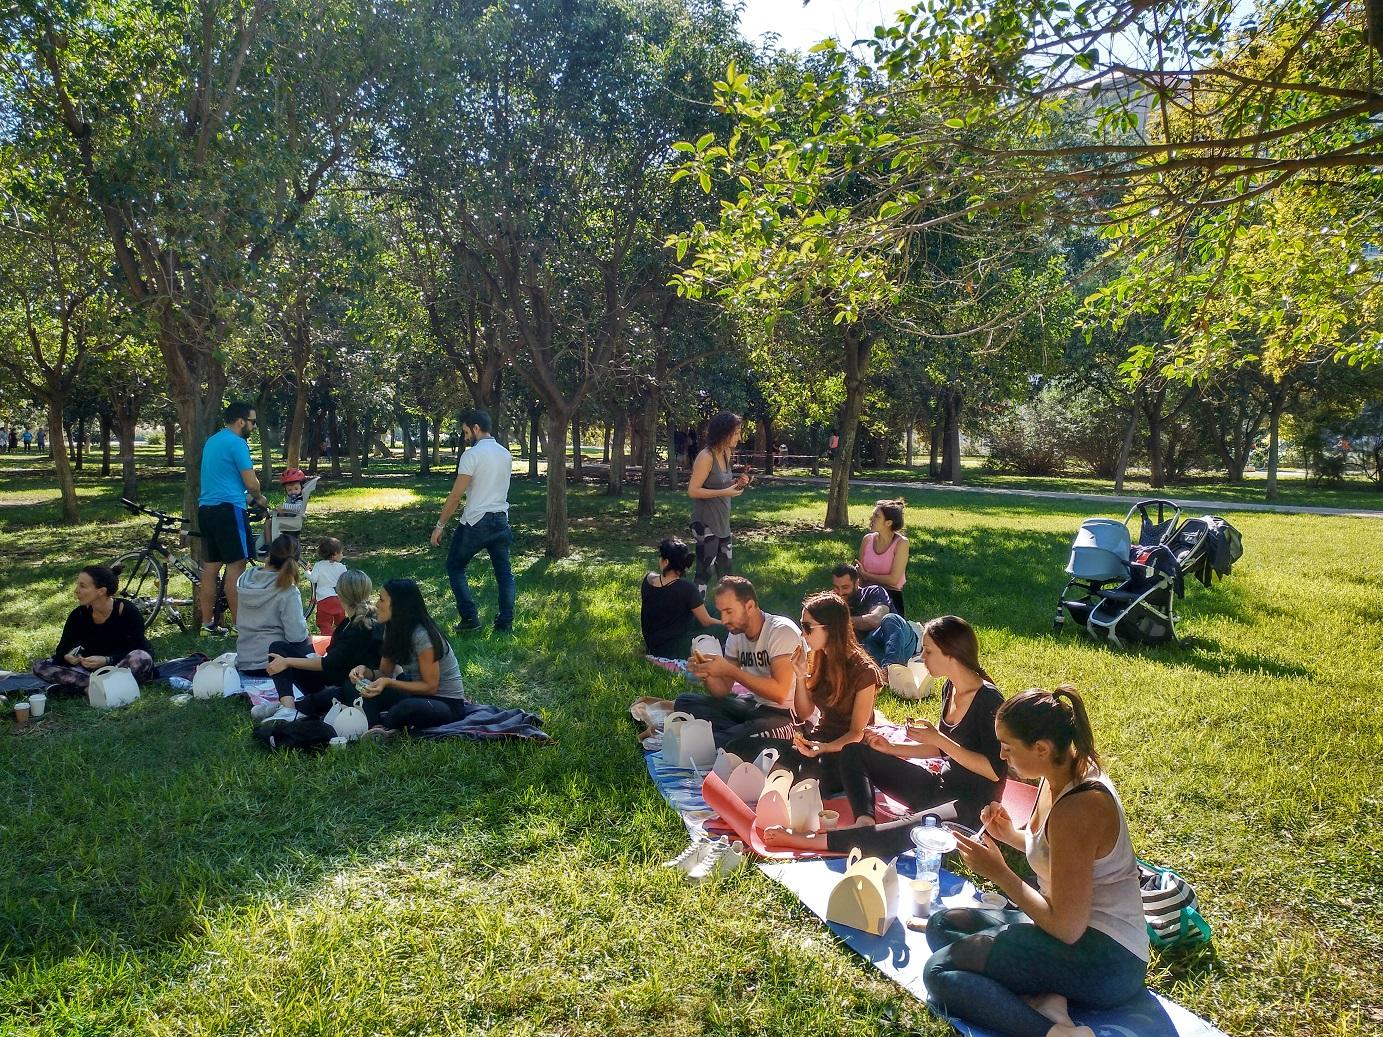 Yoga & picnic